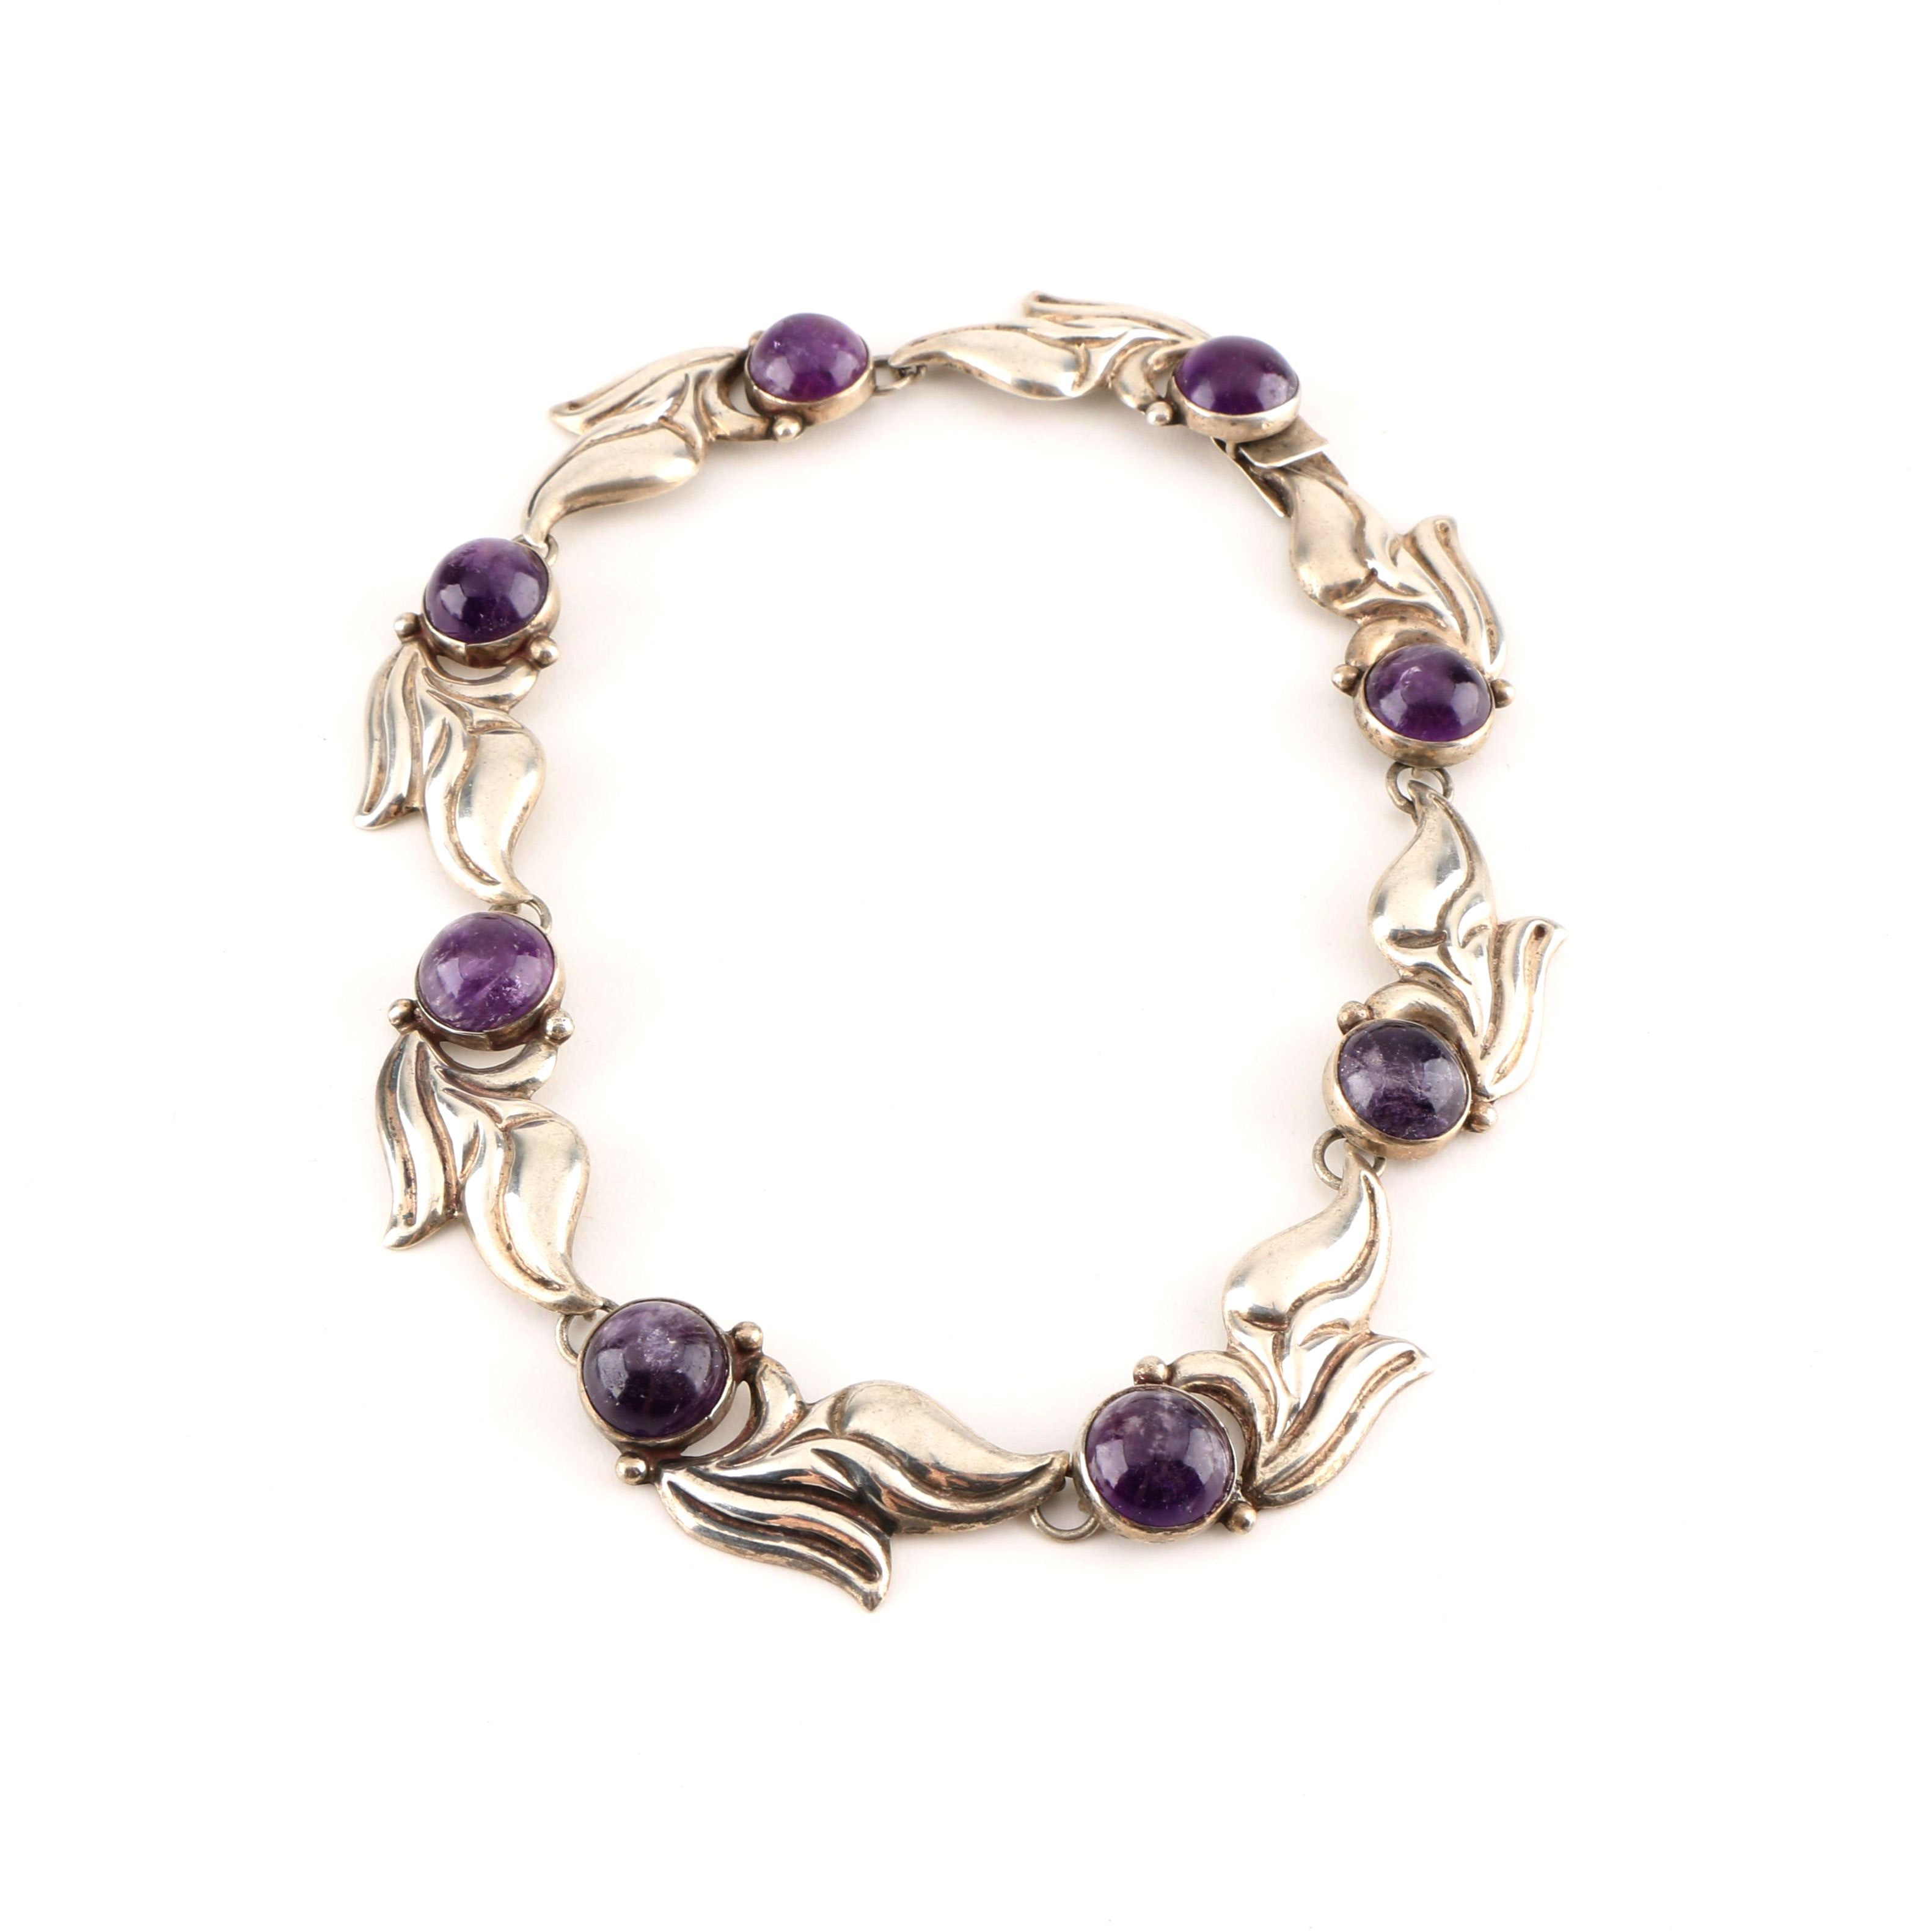 Jose Anton Sterling Silver Amethyst Necklace